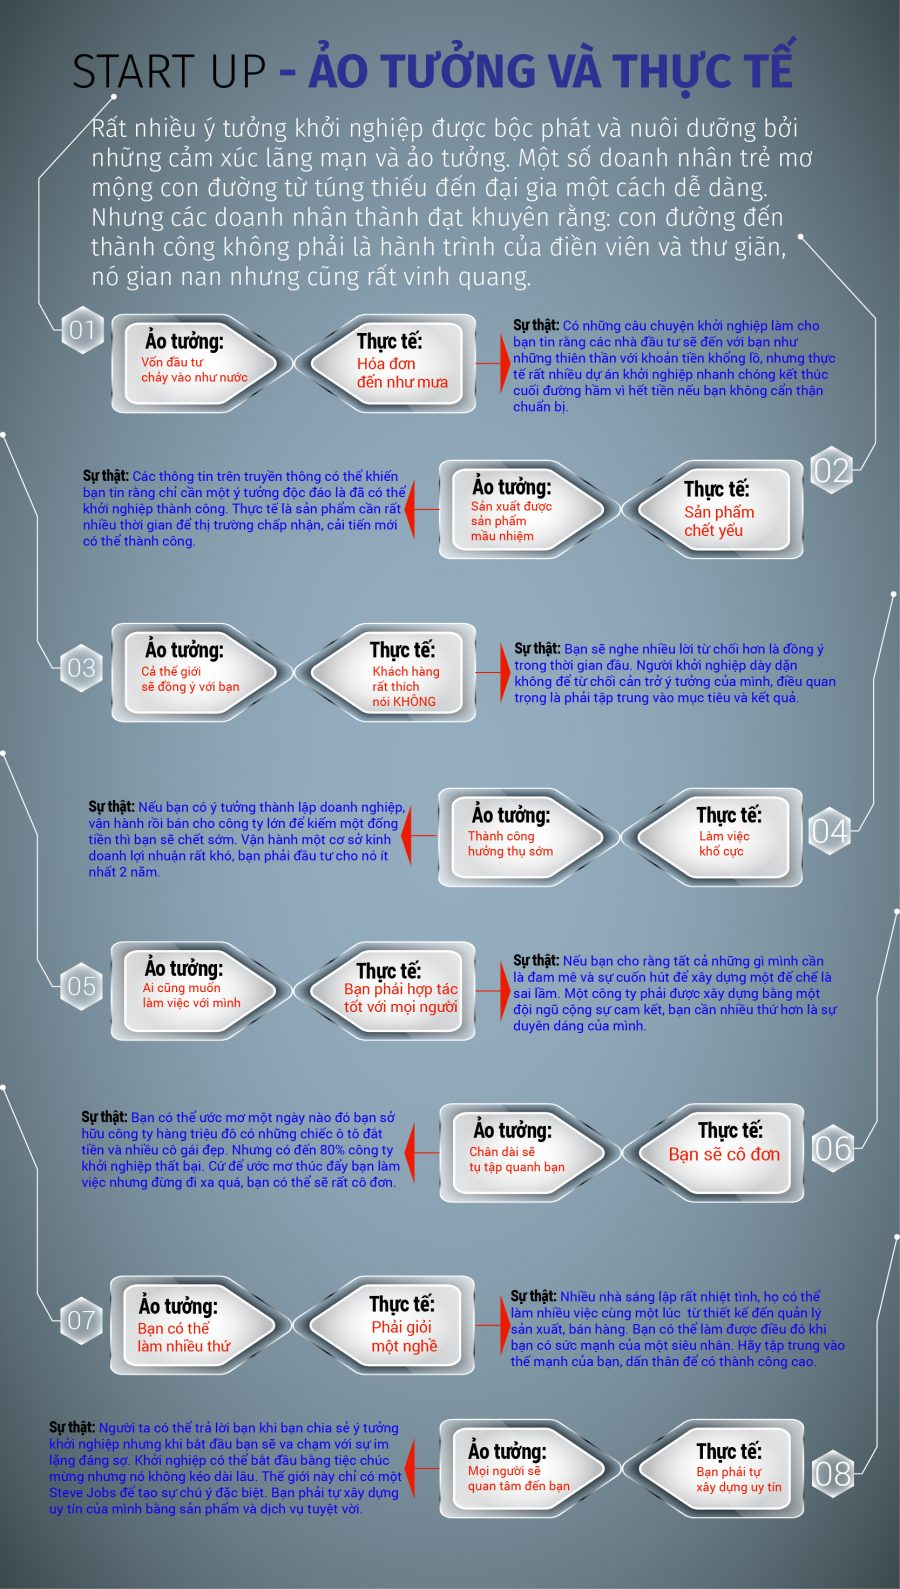 infographic-startup-ao-tuong-va-thuc-te